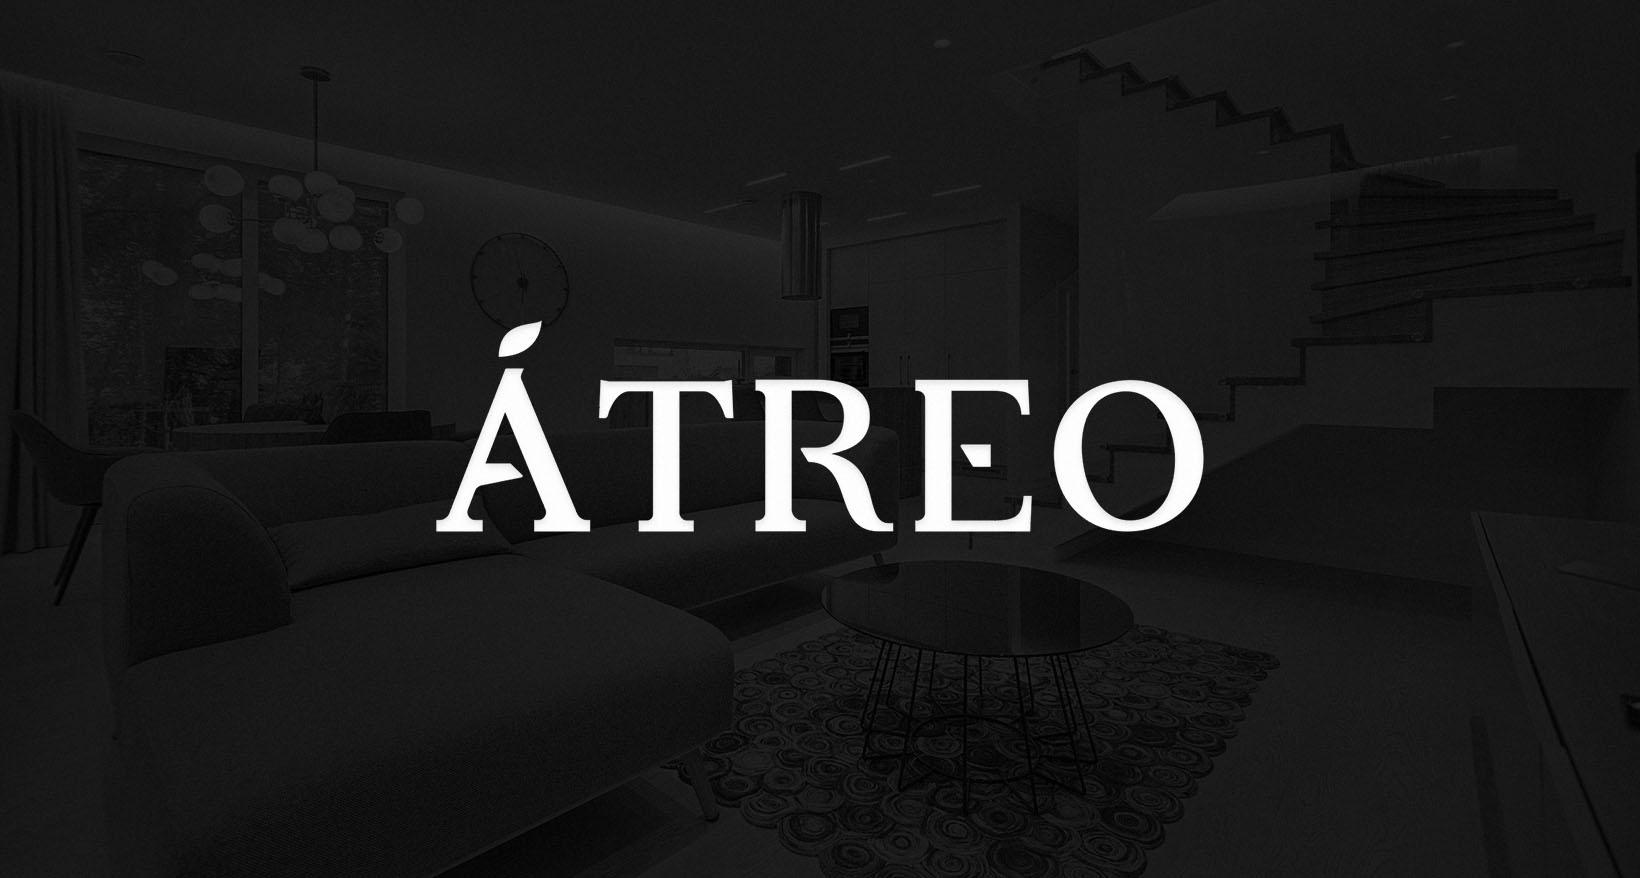 Agency Mangu Creates New Brand Identity for Furniture Industry Átreo